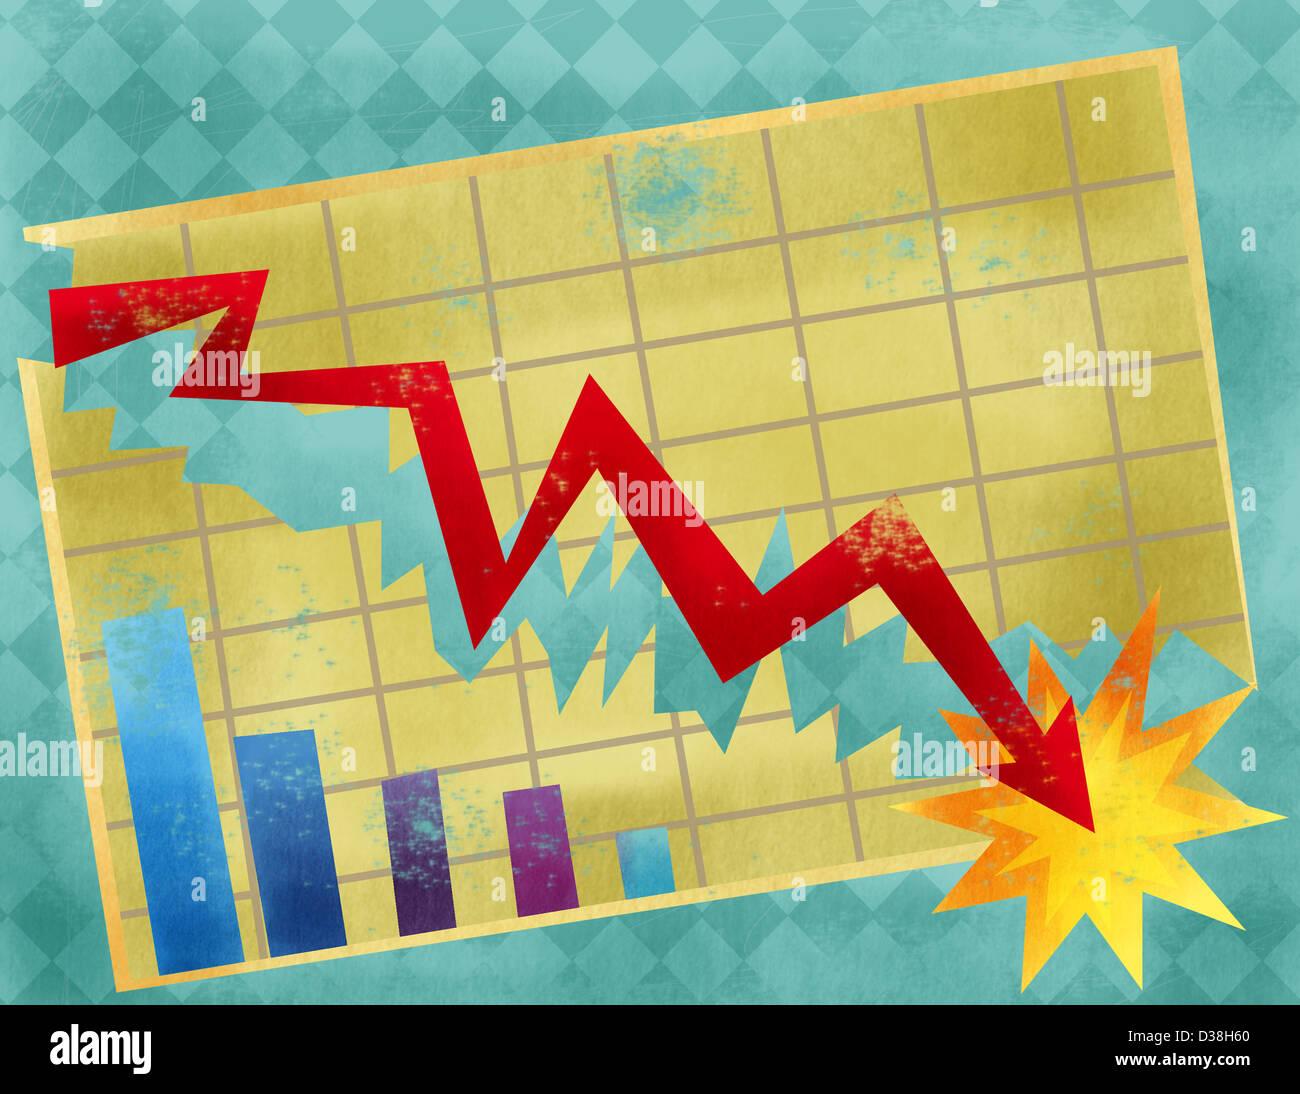 Line graph showing economy crash Stock Photo